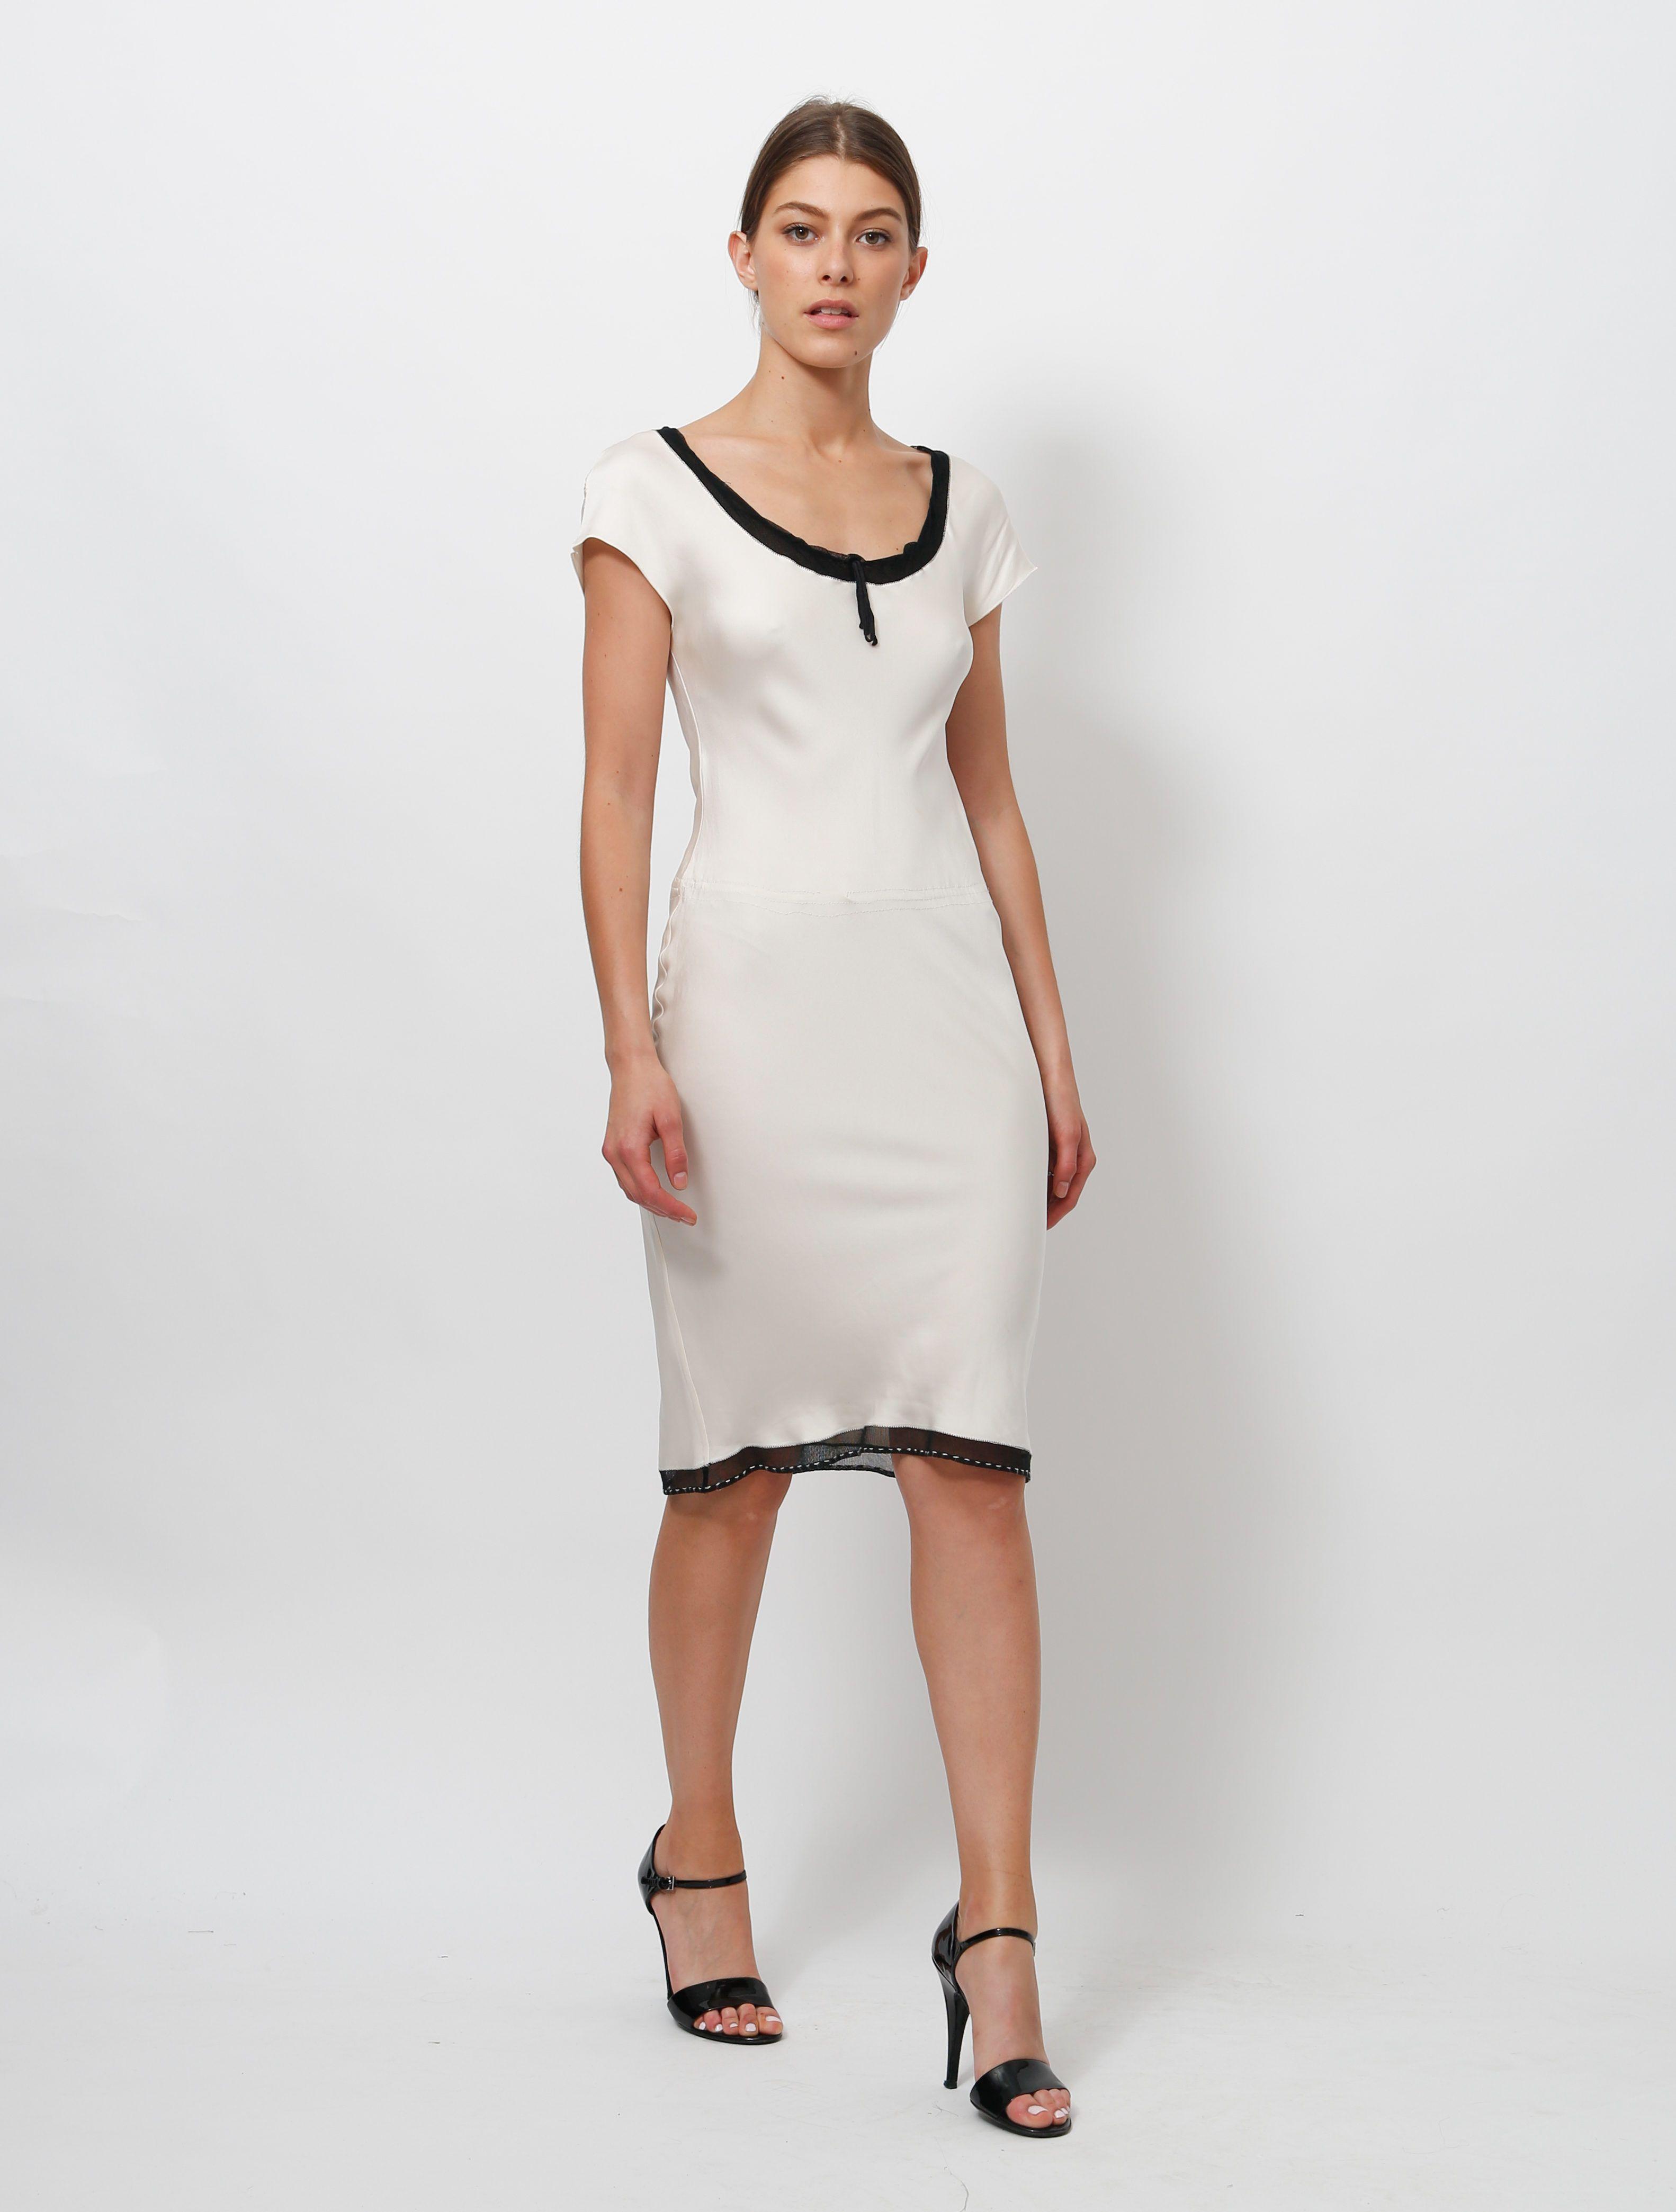 Prada Silk Slip Dress Silk Slip Dress Lace Dress Black White Slip Dress [ 4178 x 3165 Pixel ]